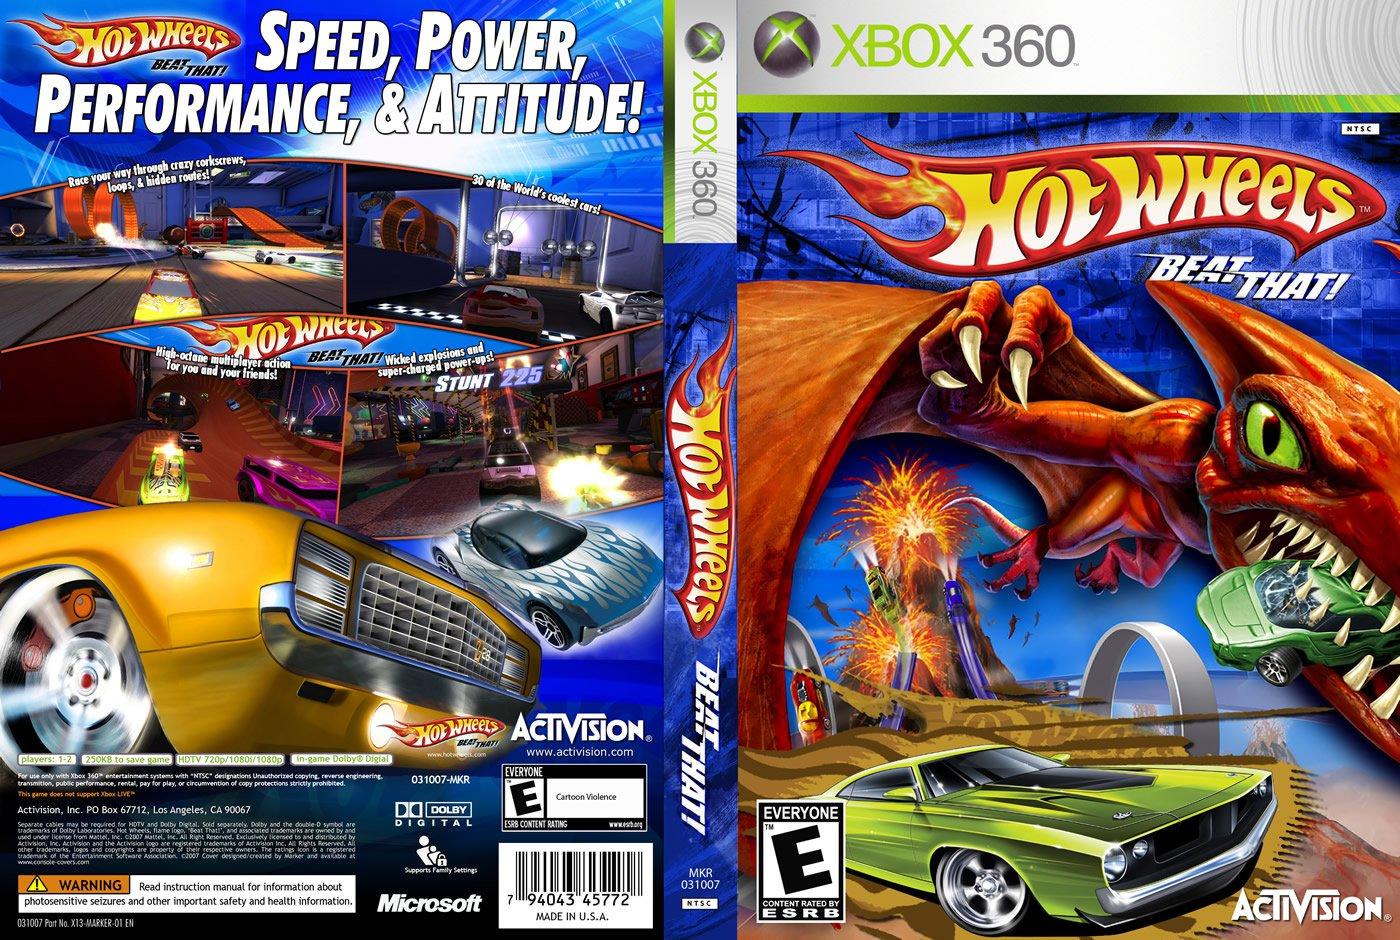 Hot Wheels Beat That Xbox 360